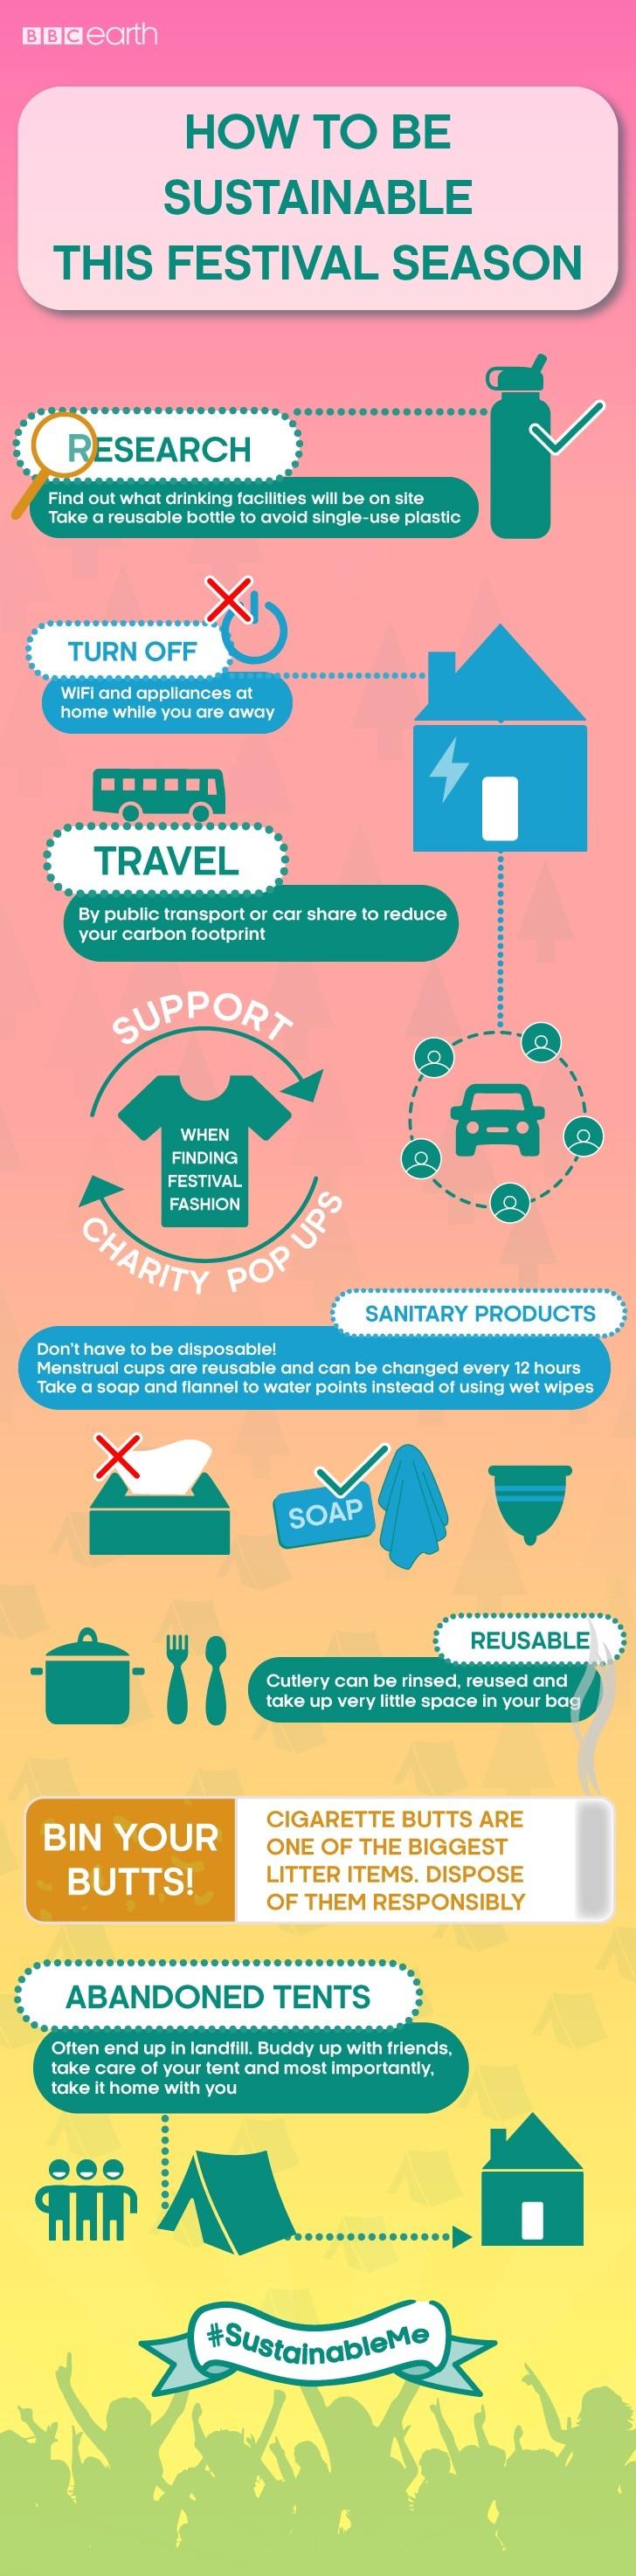 infographic on sustainability